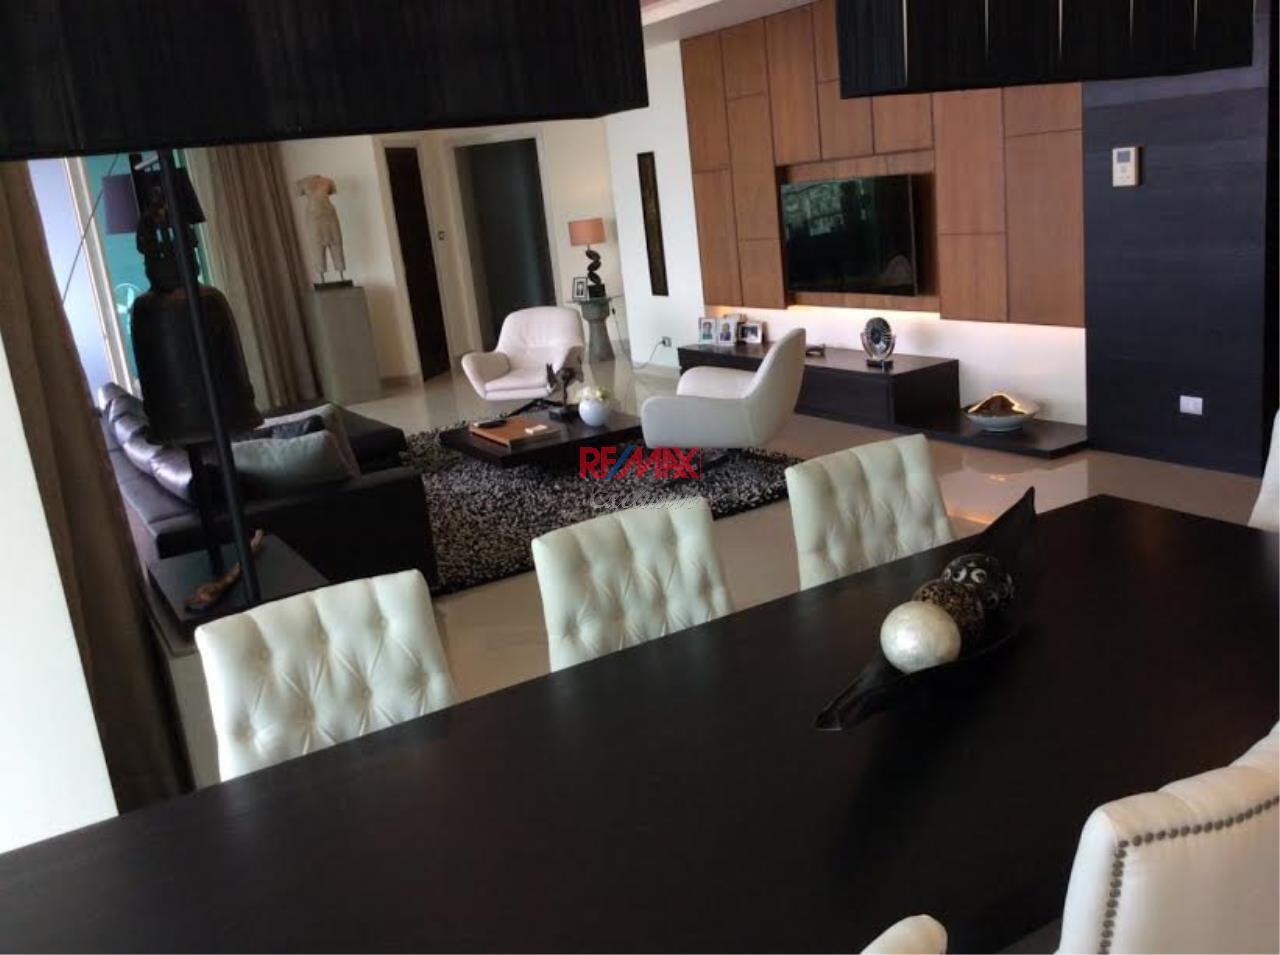 RE/MAX Exclusive Agency's Watermark Chaophraya Condominium, 4 bedrooms, 4 bathrooms, For Sale 47,500,000 THB 3